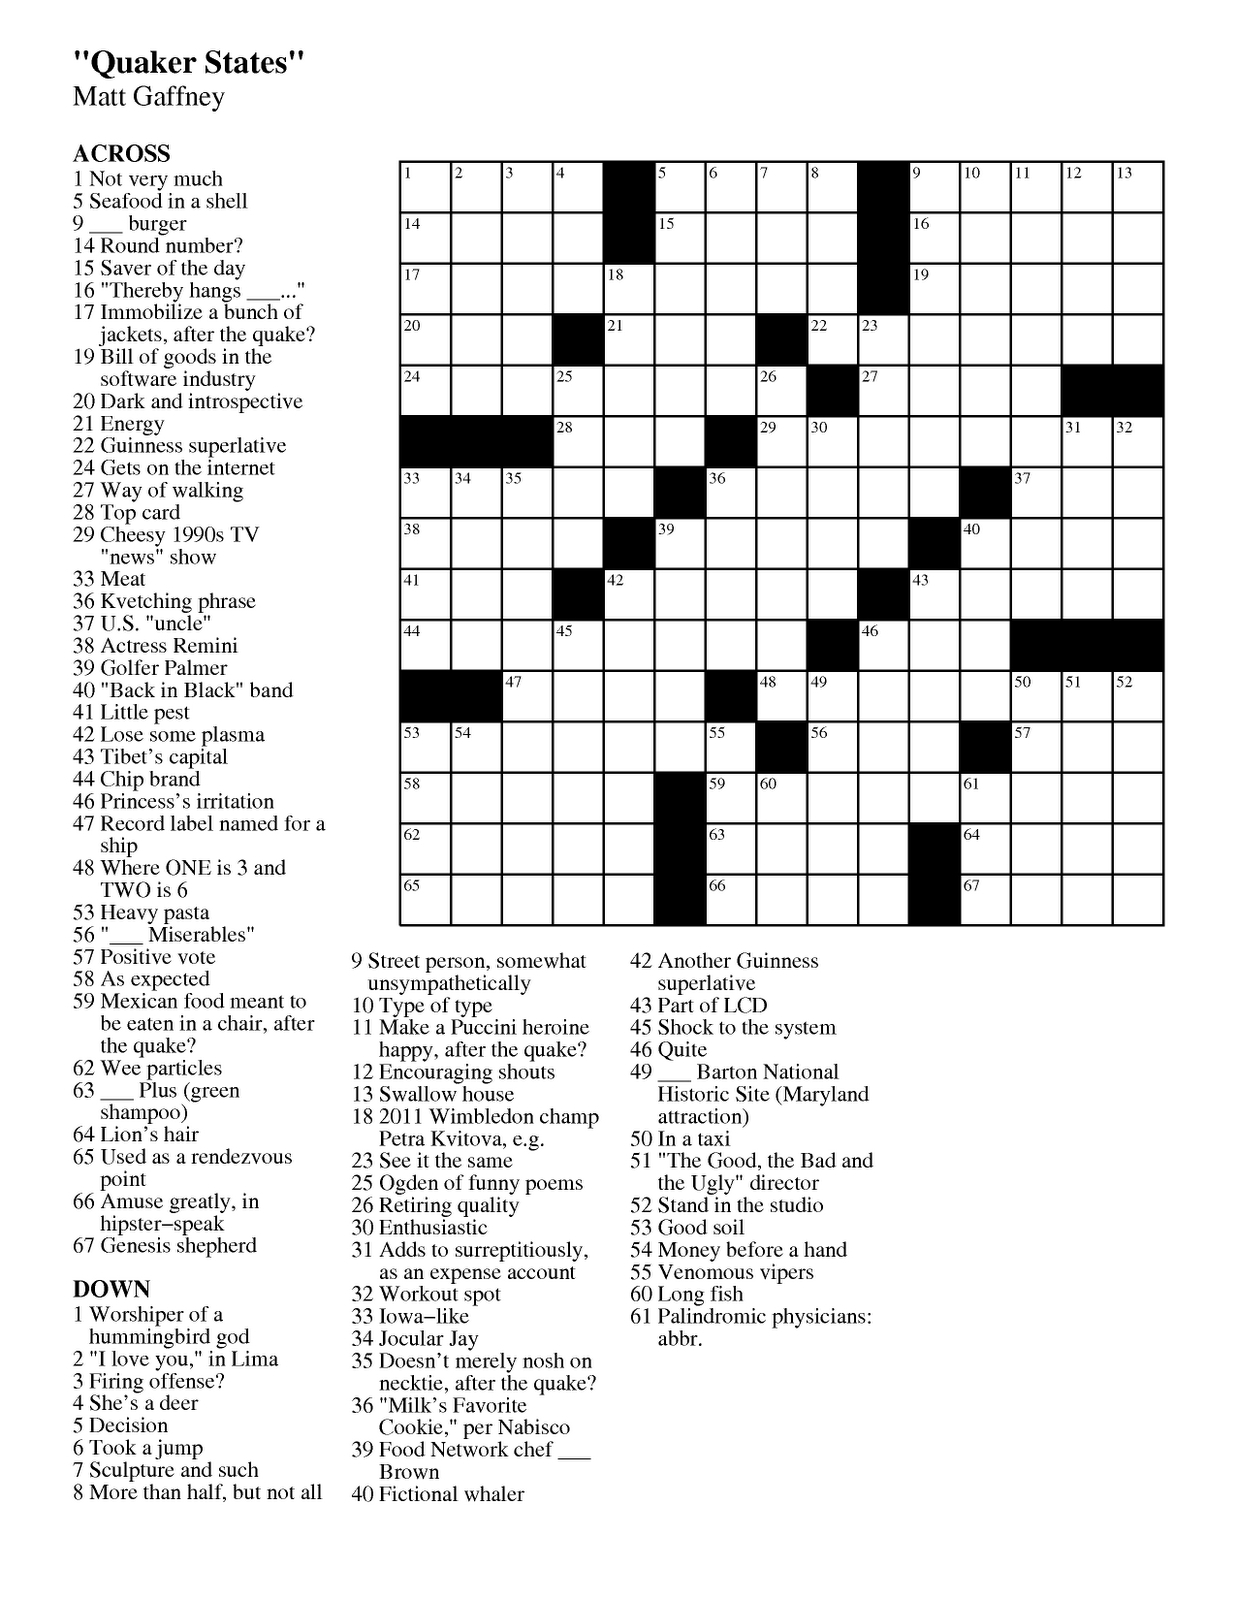 Free Printable Large Print Crossword Puzzles | M3U8 - Summer Crossword Puzzle Free Printable